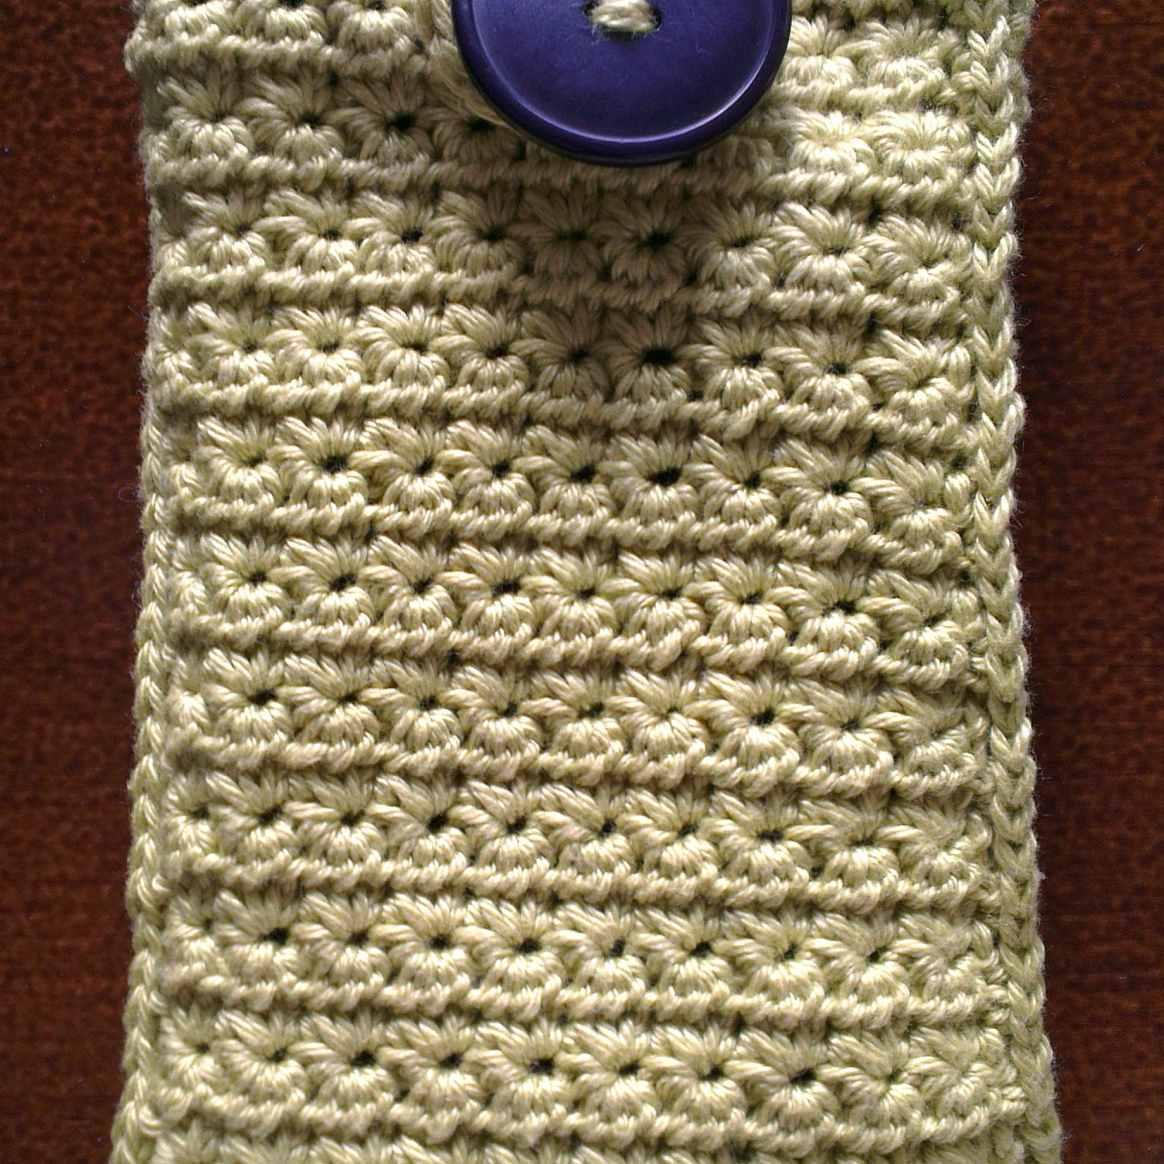 Star Stitch Cell Phone Case Free Crochet Pattern